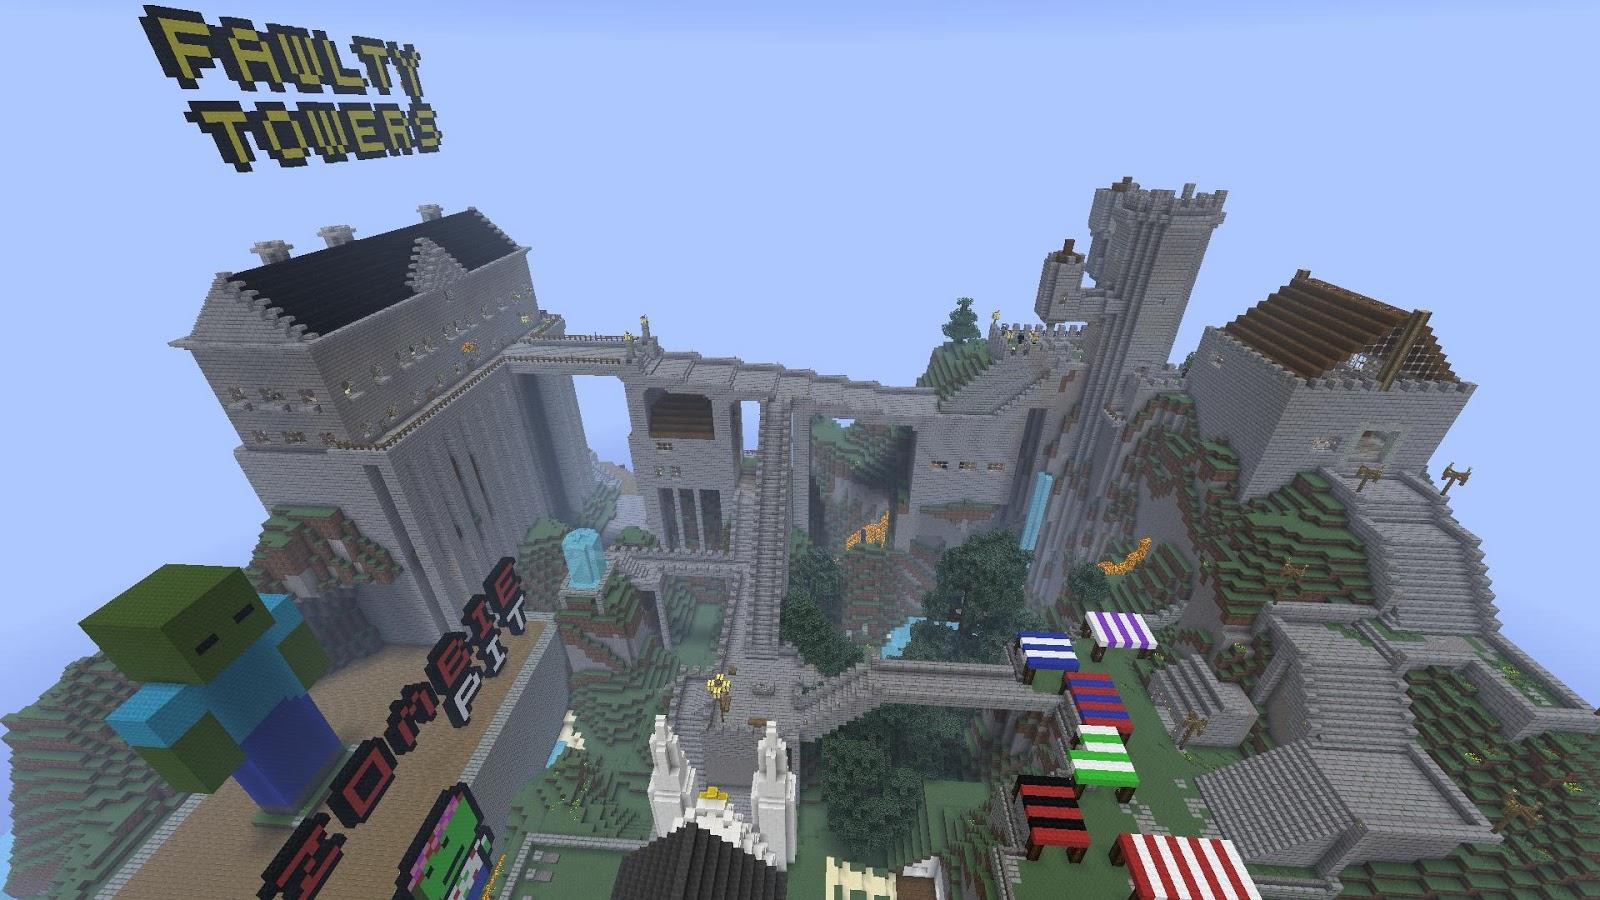 Minecraft item list full servers freebuild pic 3 apps directories